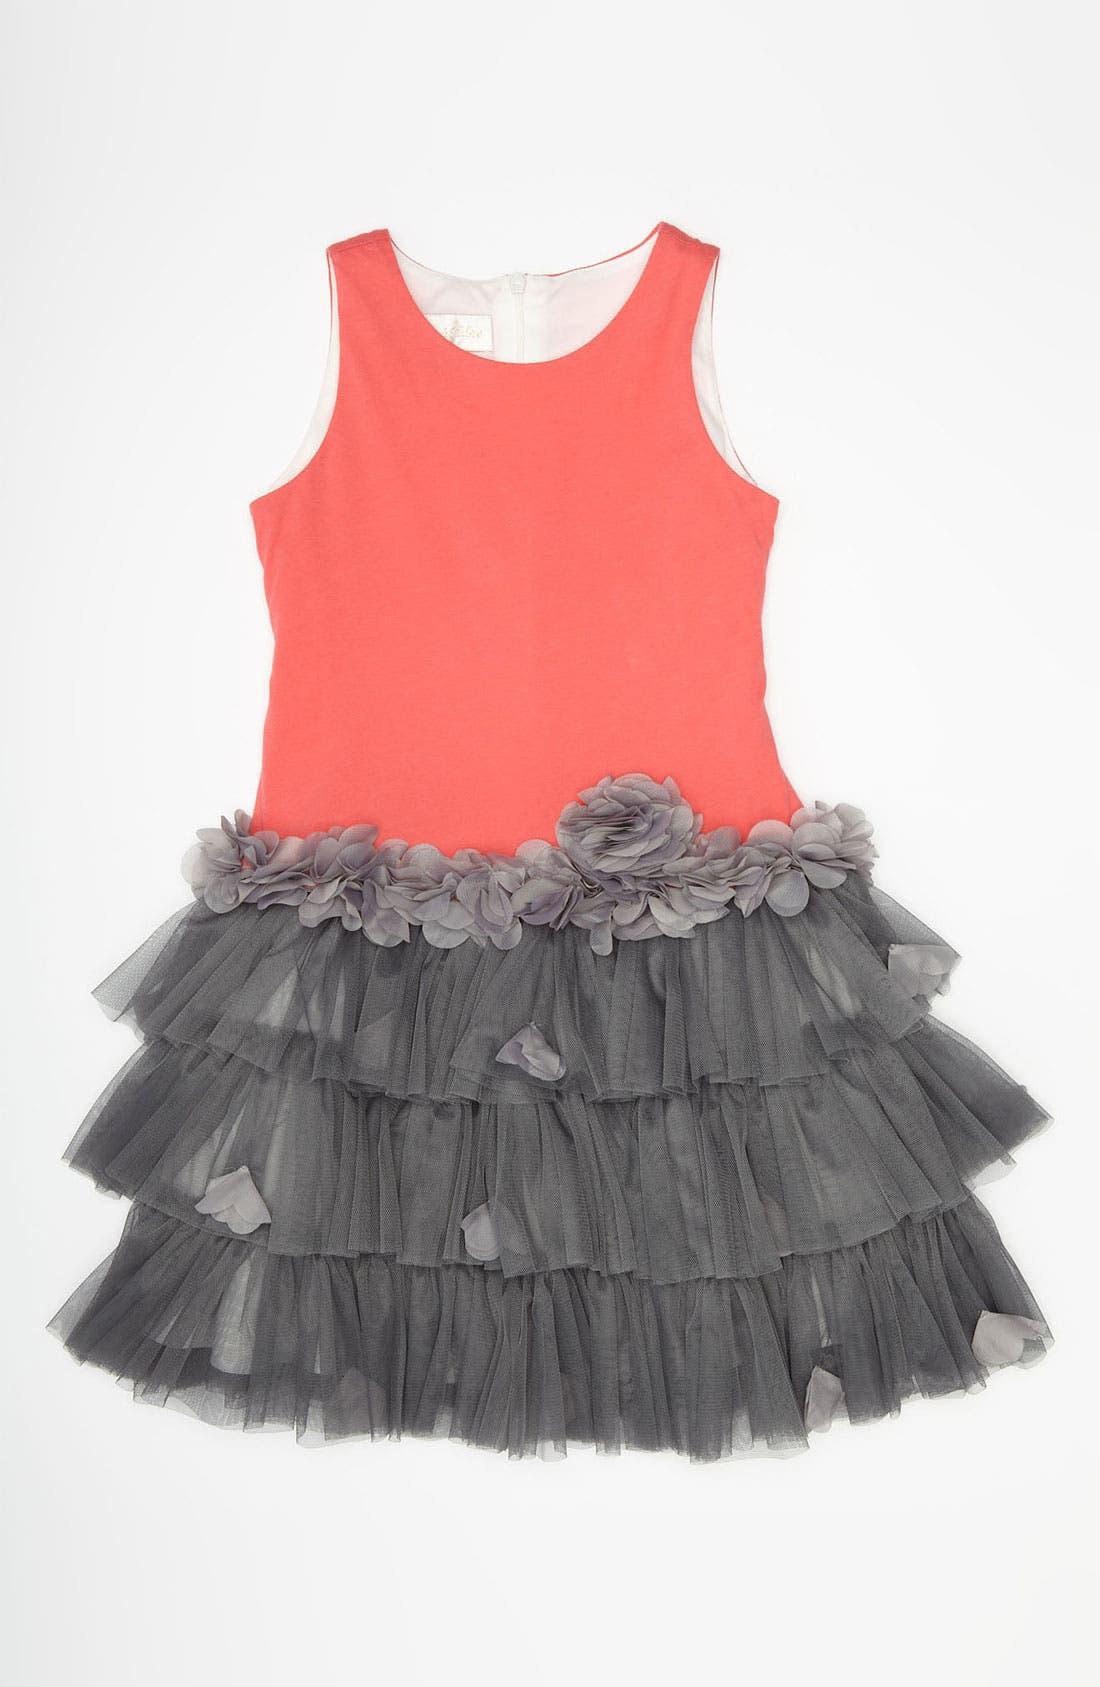 Alternate Image 1 Selected - Isobella & Chloe Tutu Dress (Little Girls & Big Girls)